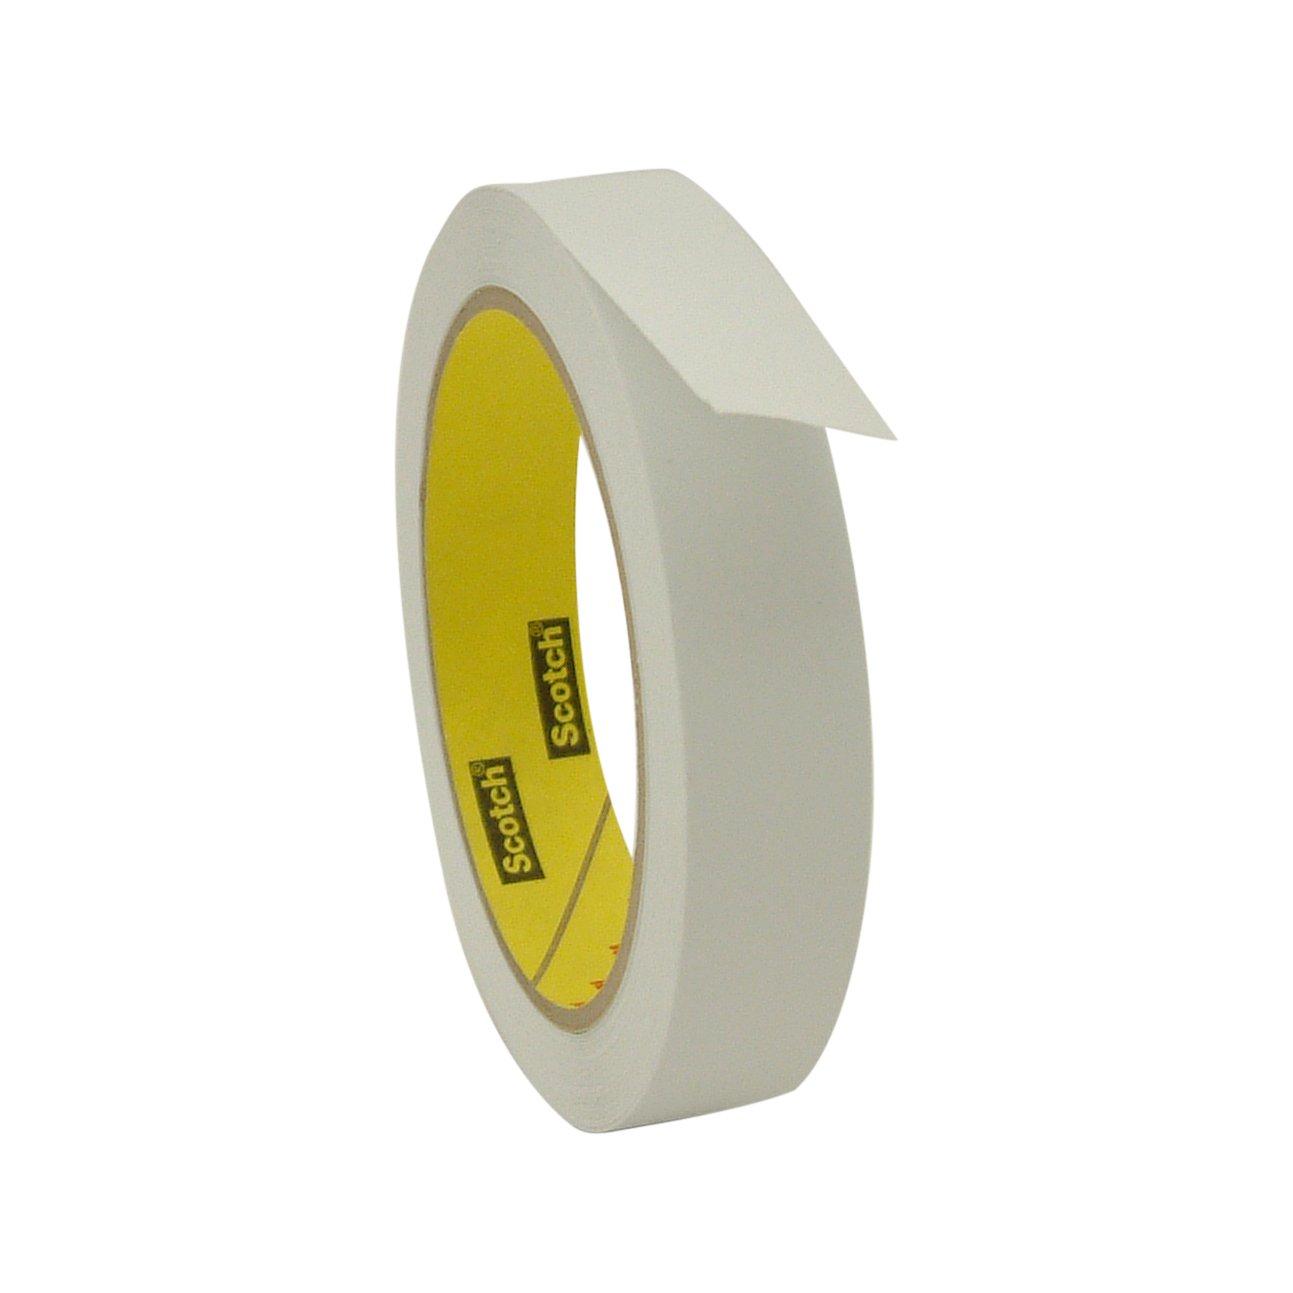 3M 3051/WI07536 Scotch 3051 Low Tack Paper Tape: 3/4'' x 36 yd, White